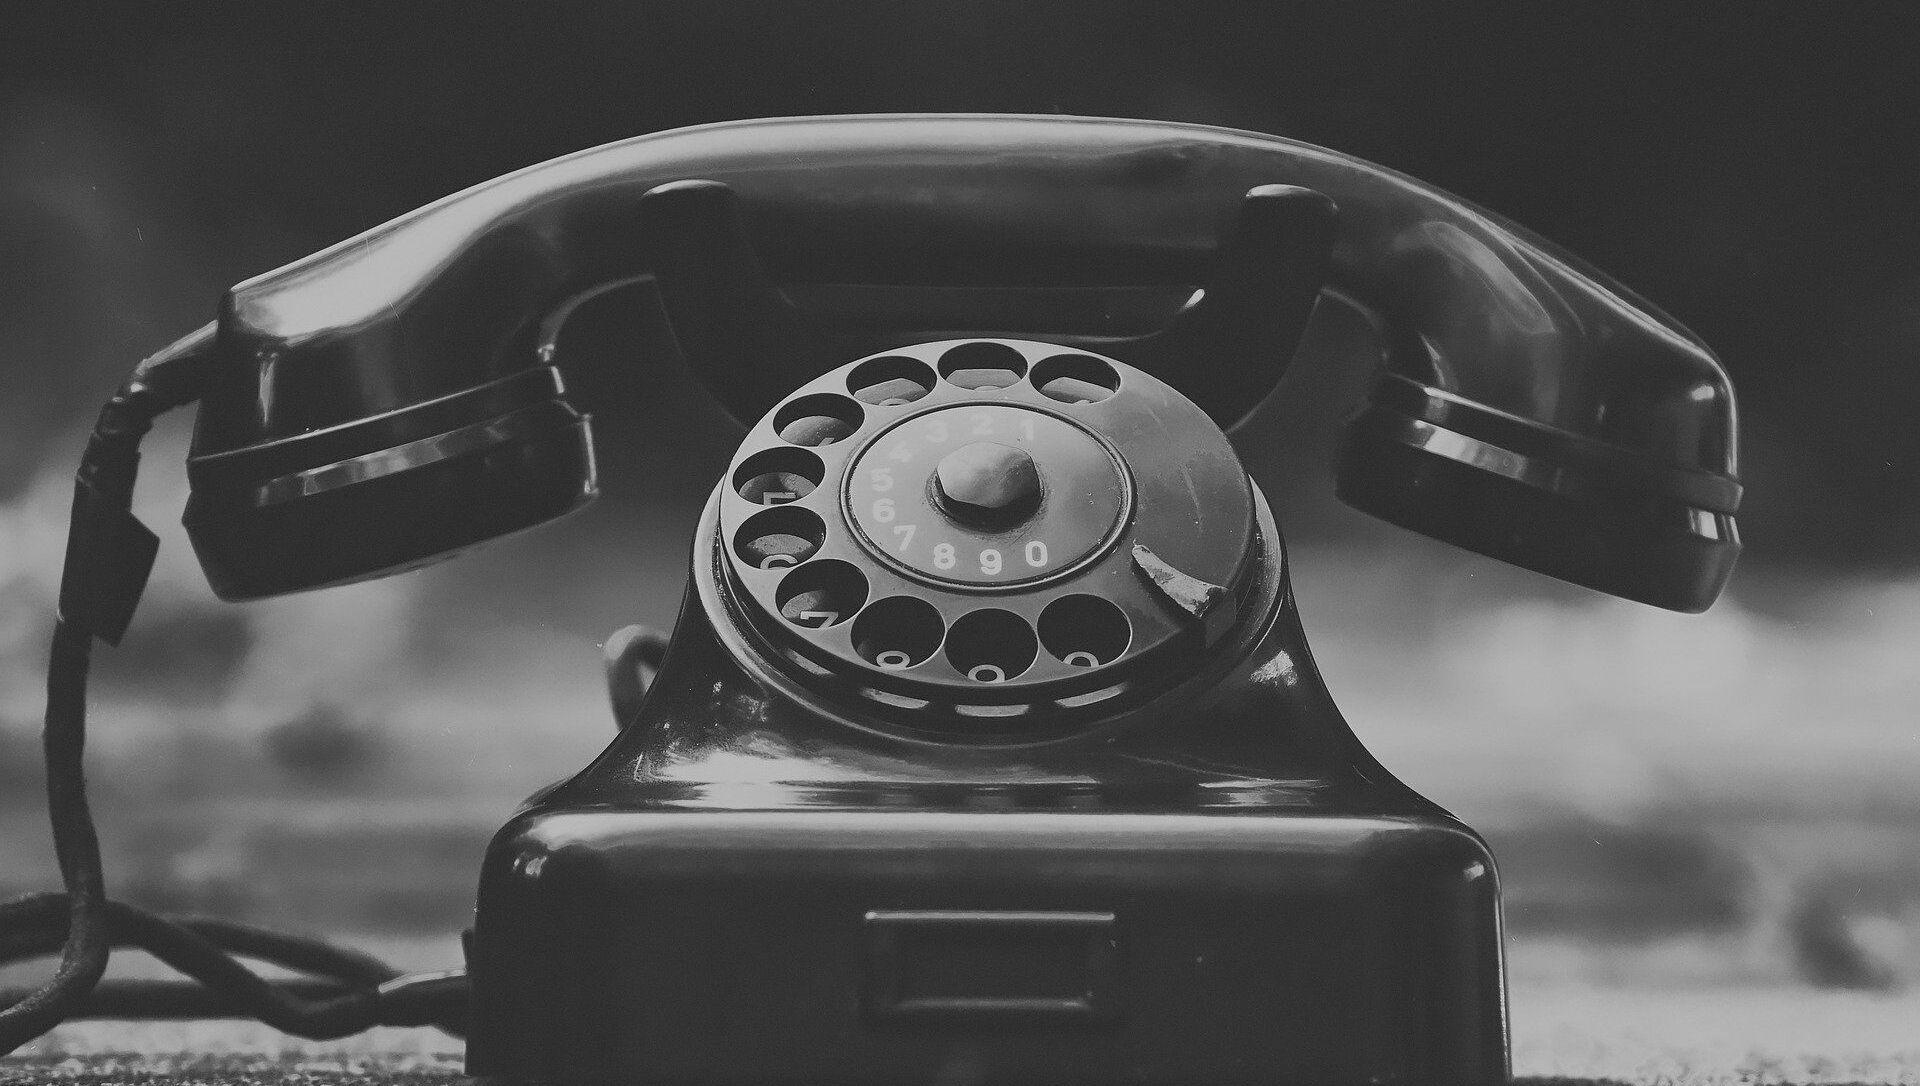 Un teléfono (imagen referencial) - Sputnik Mundo, 1920, 19.01.2021